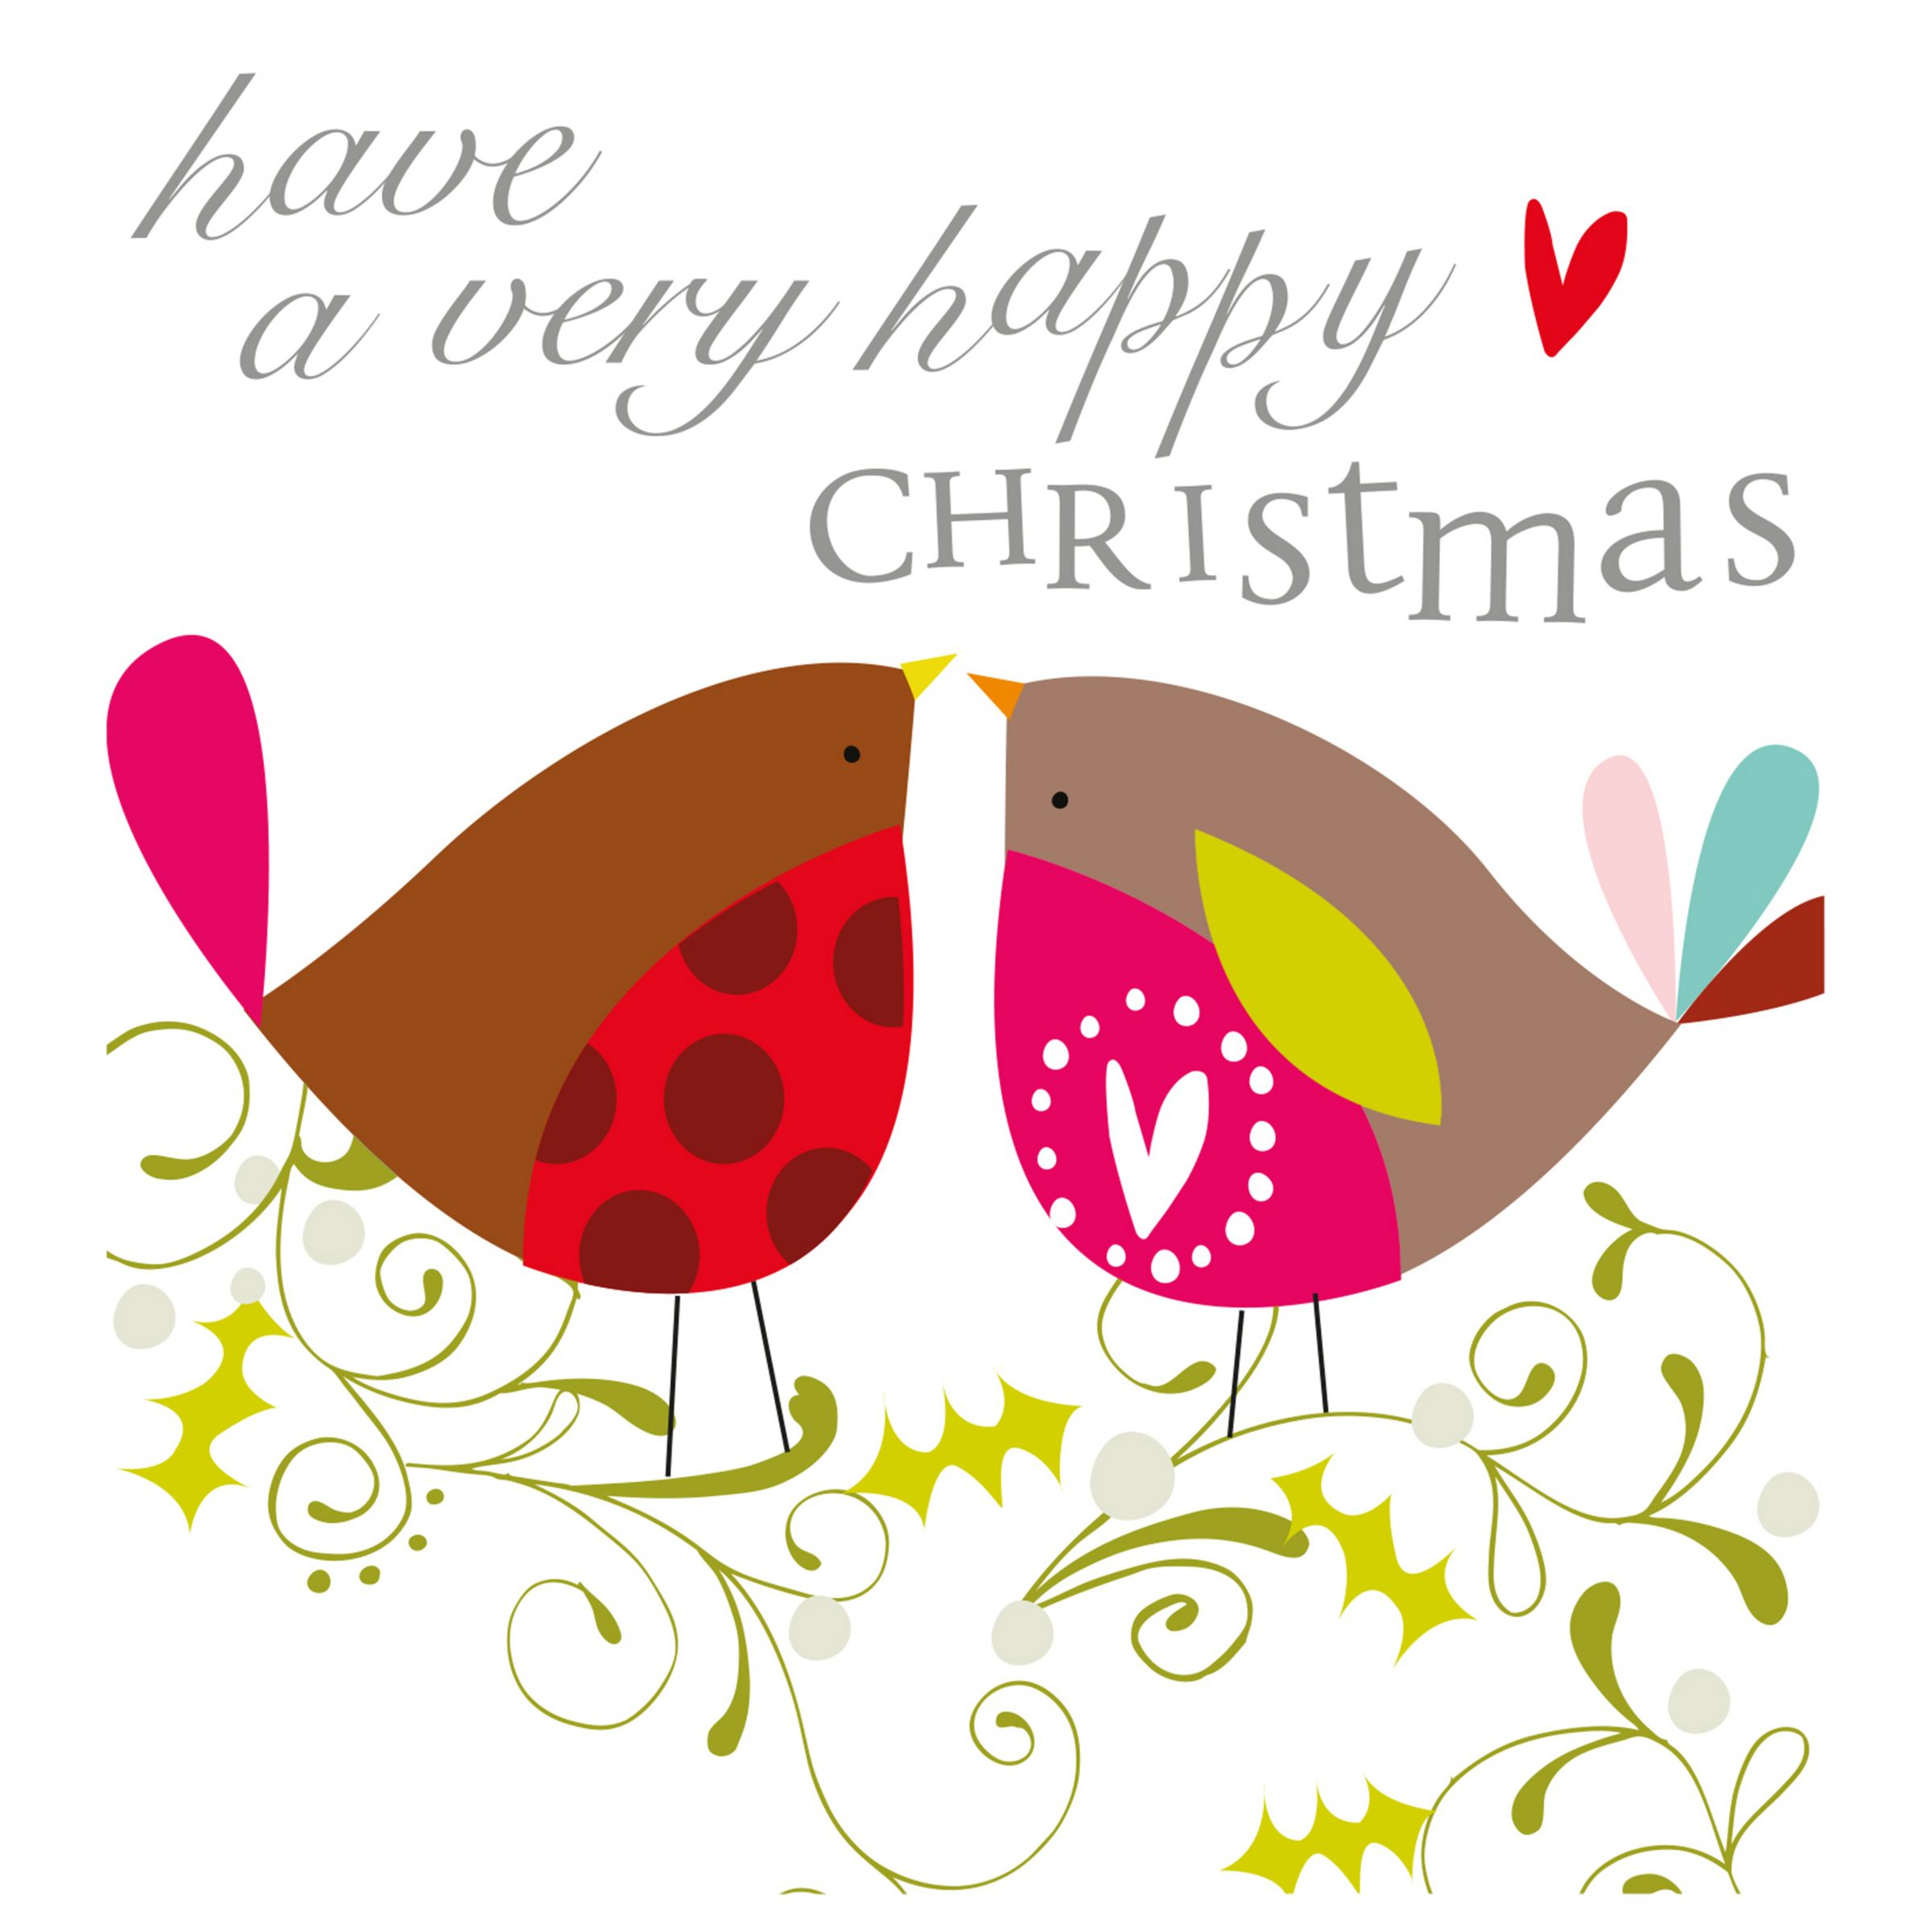 Caroline Gardner Caroline Gardner Robins Charity Christmas Cards, Pack of 5